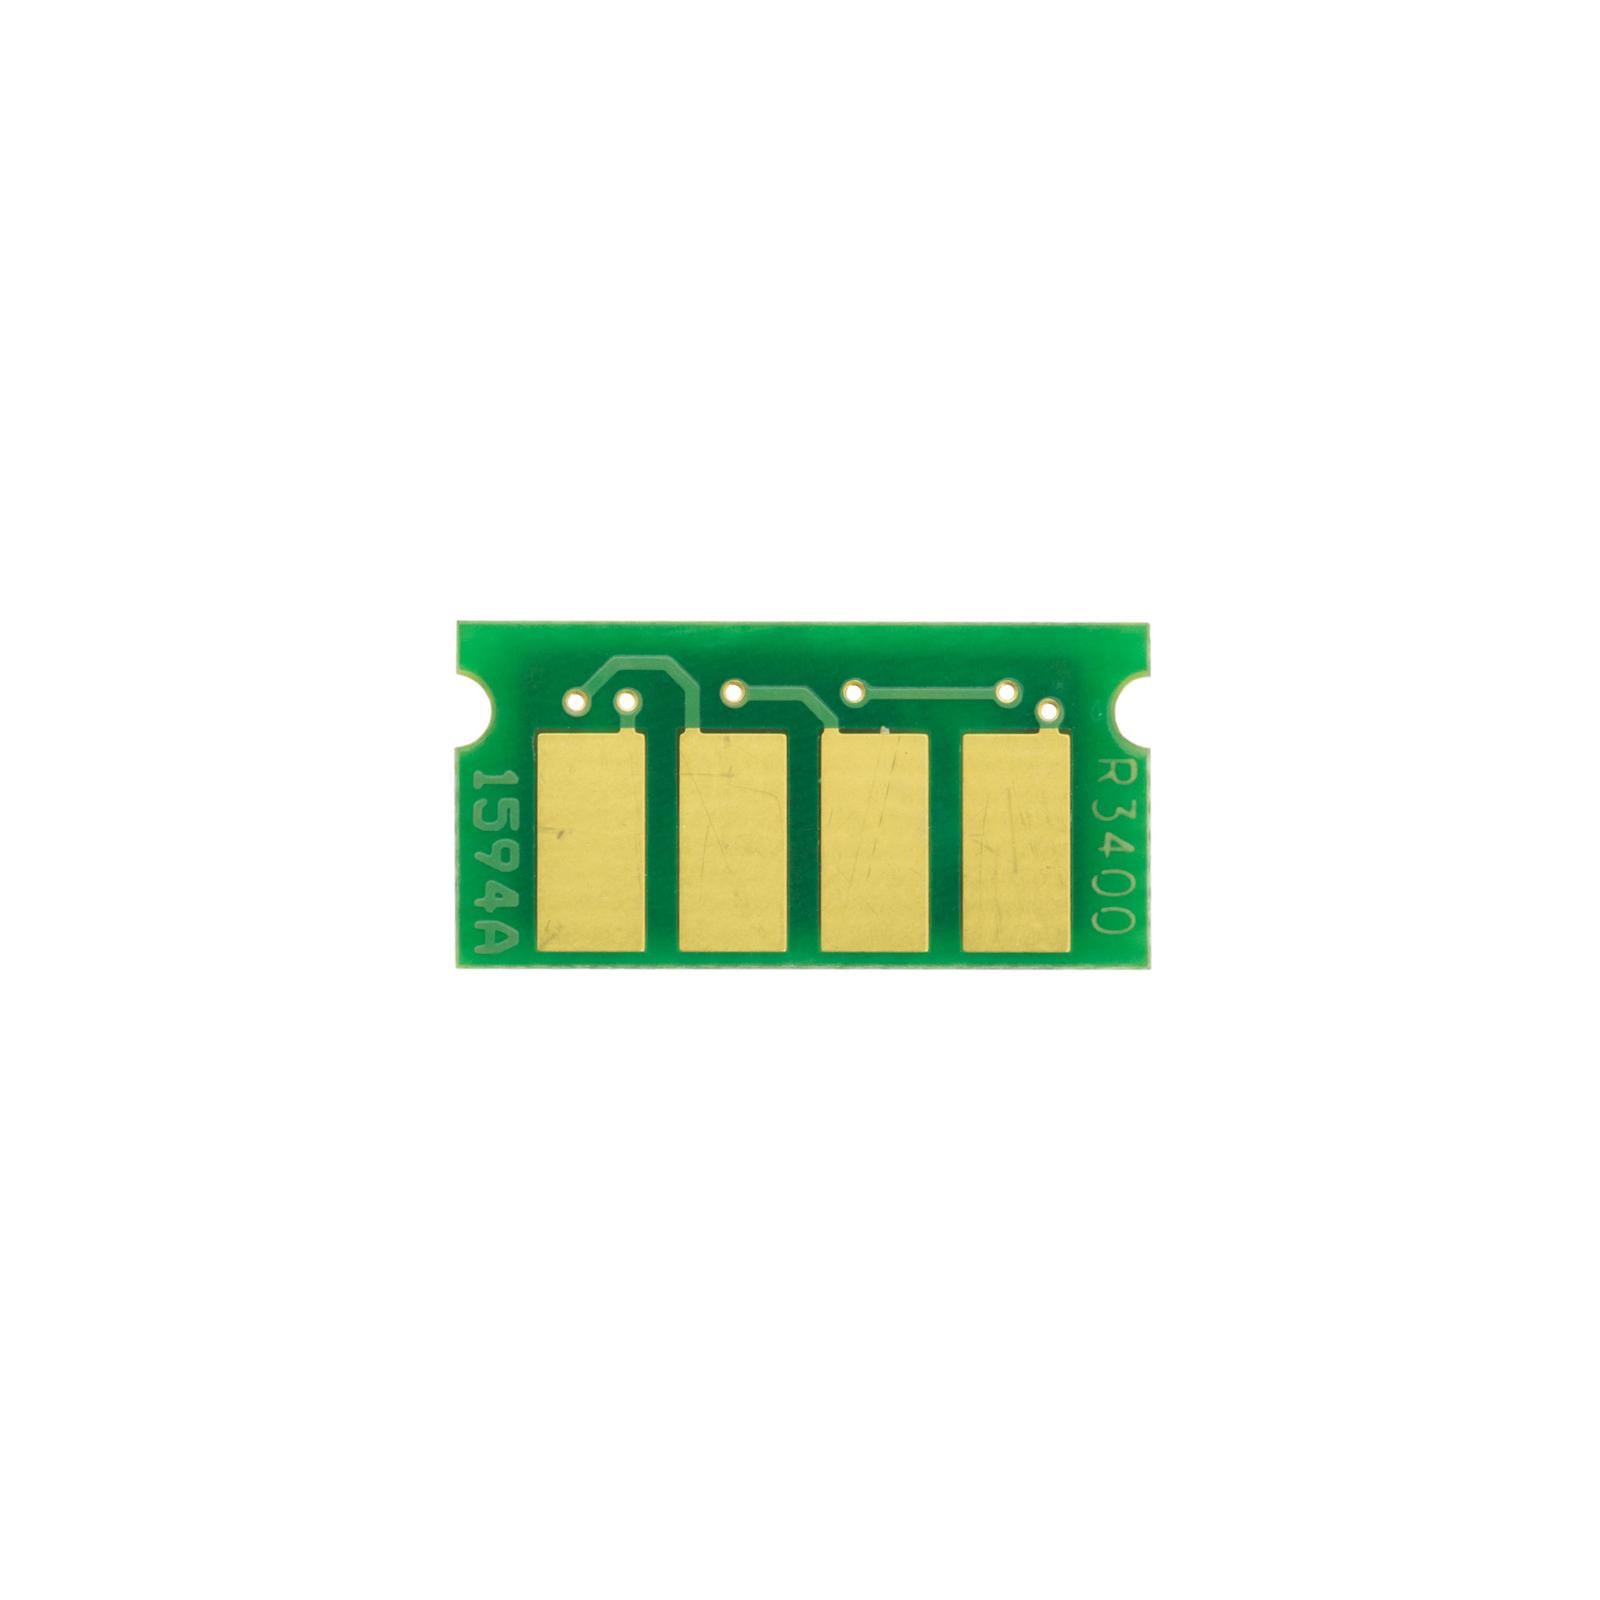 Чип для картриджа RicohAficio SP 3400 (406522) 5k Static Control (R3400CP-EU)